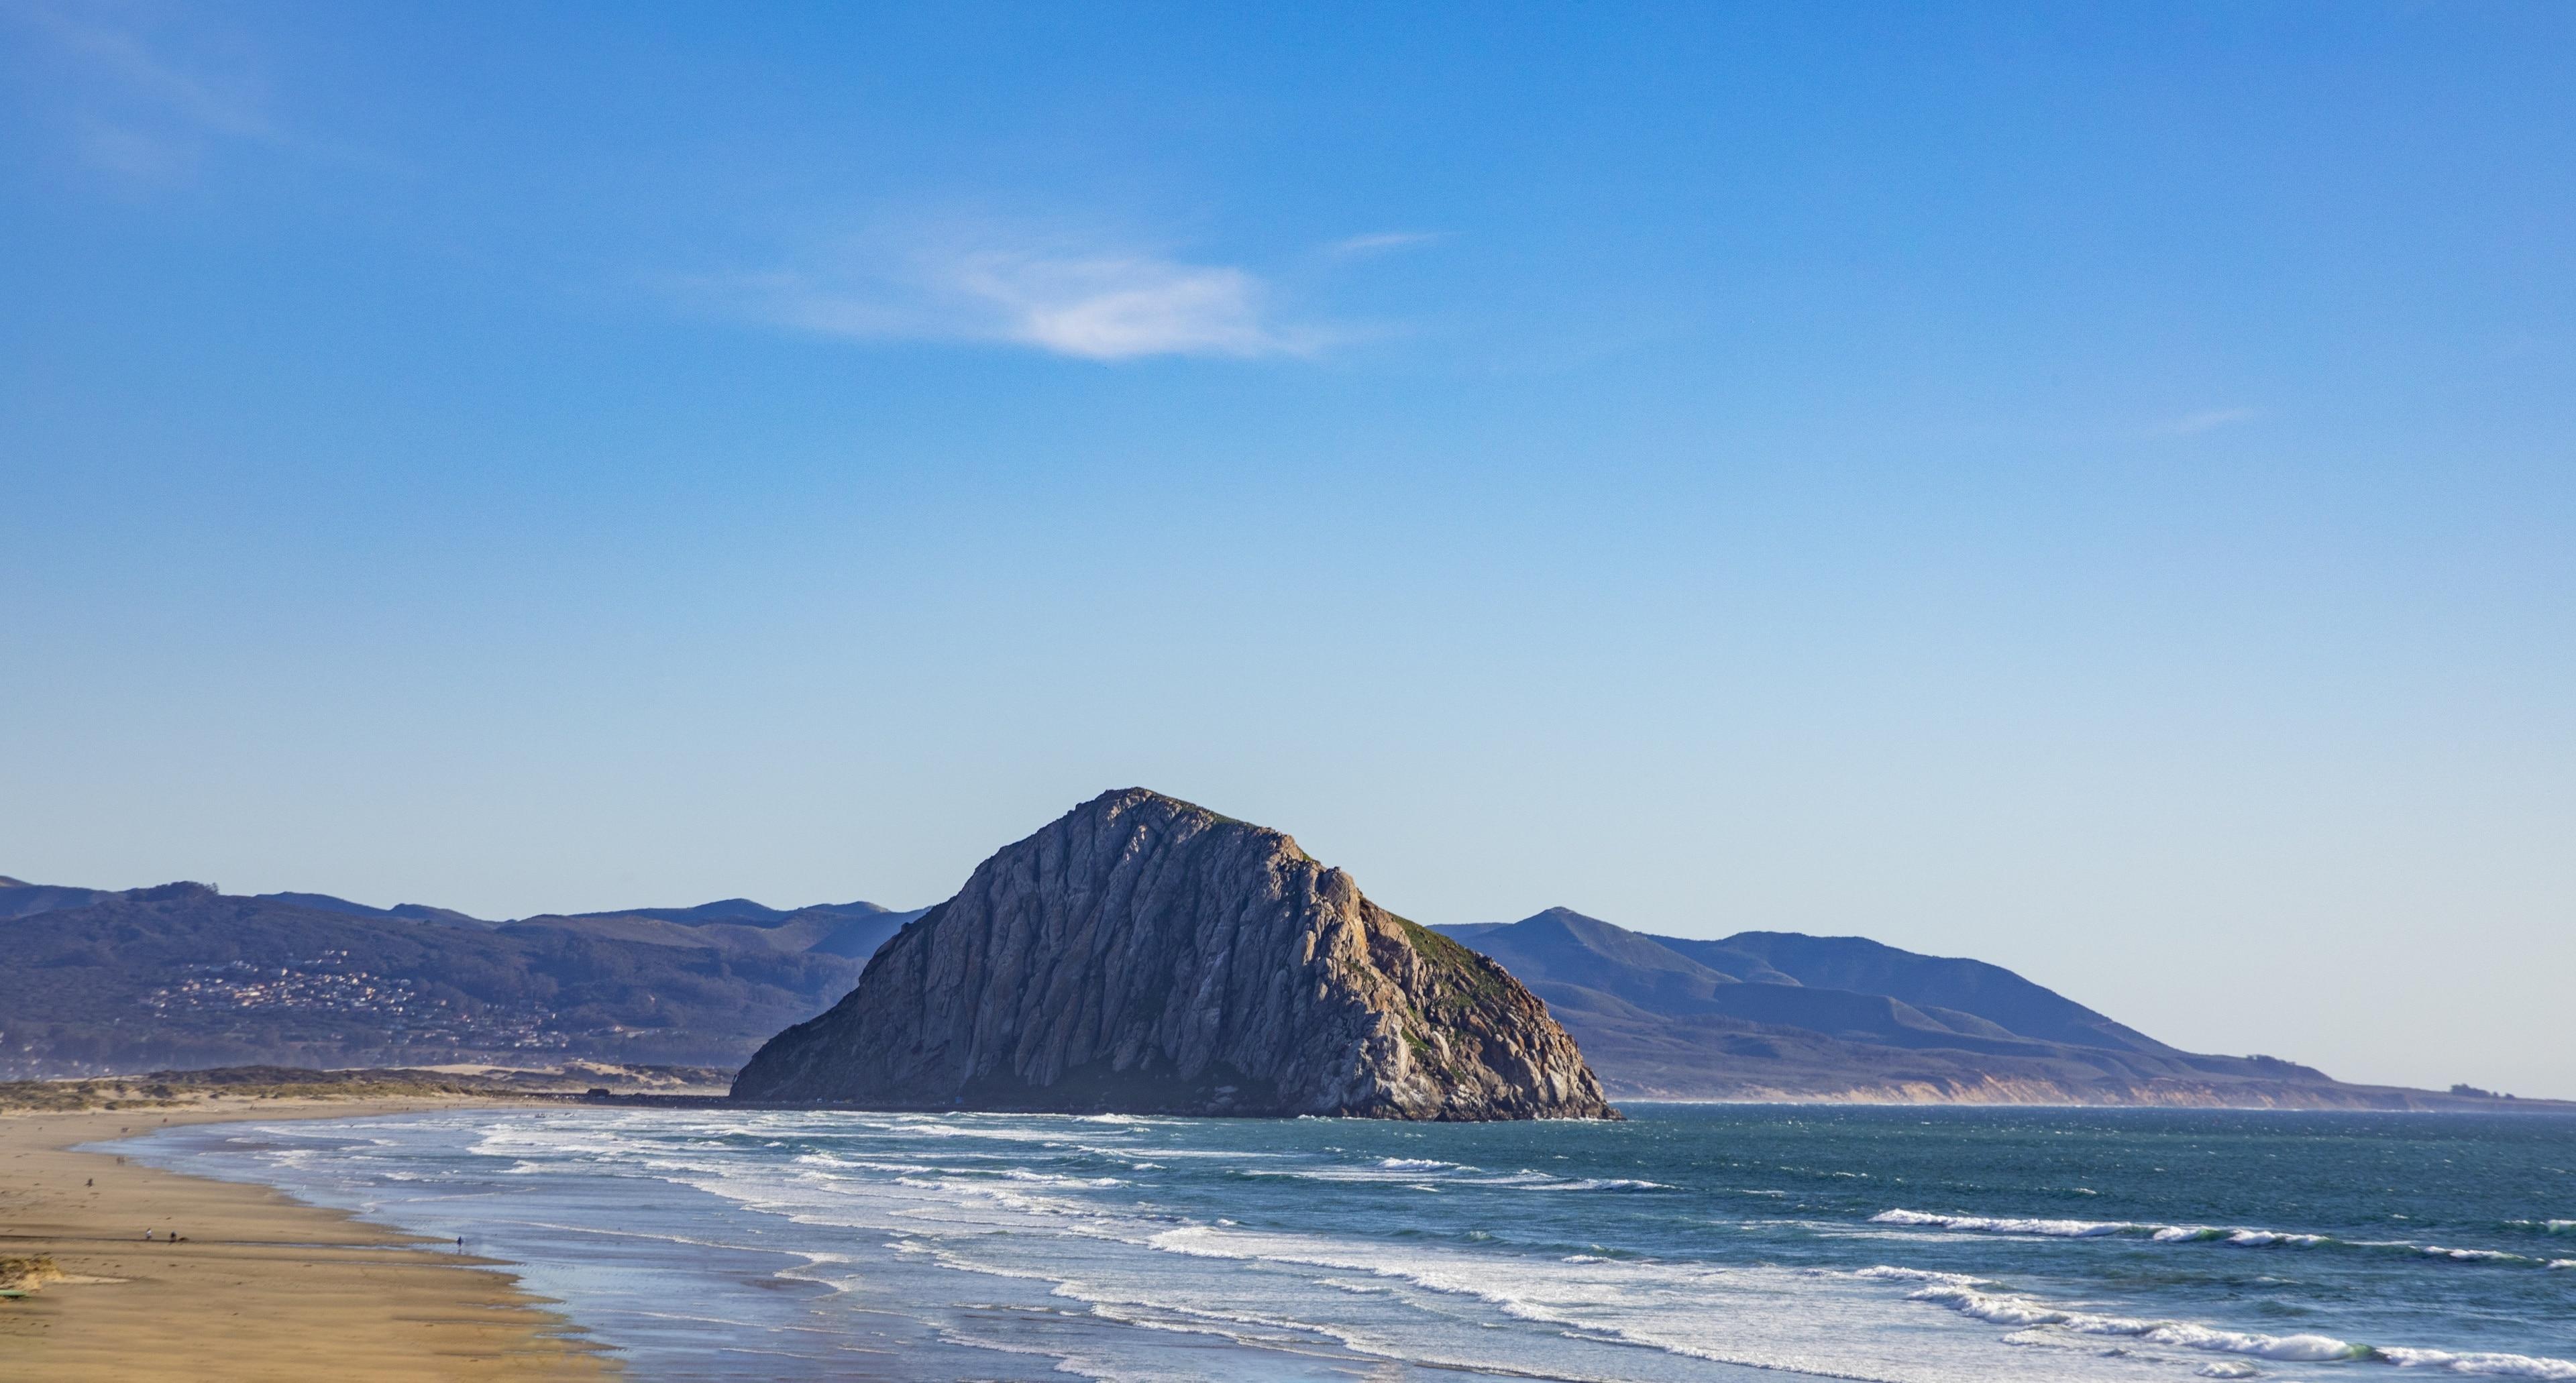 San Luis Obispo, California, United States of America